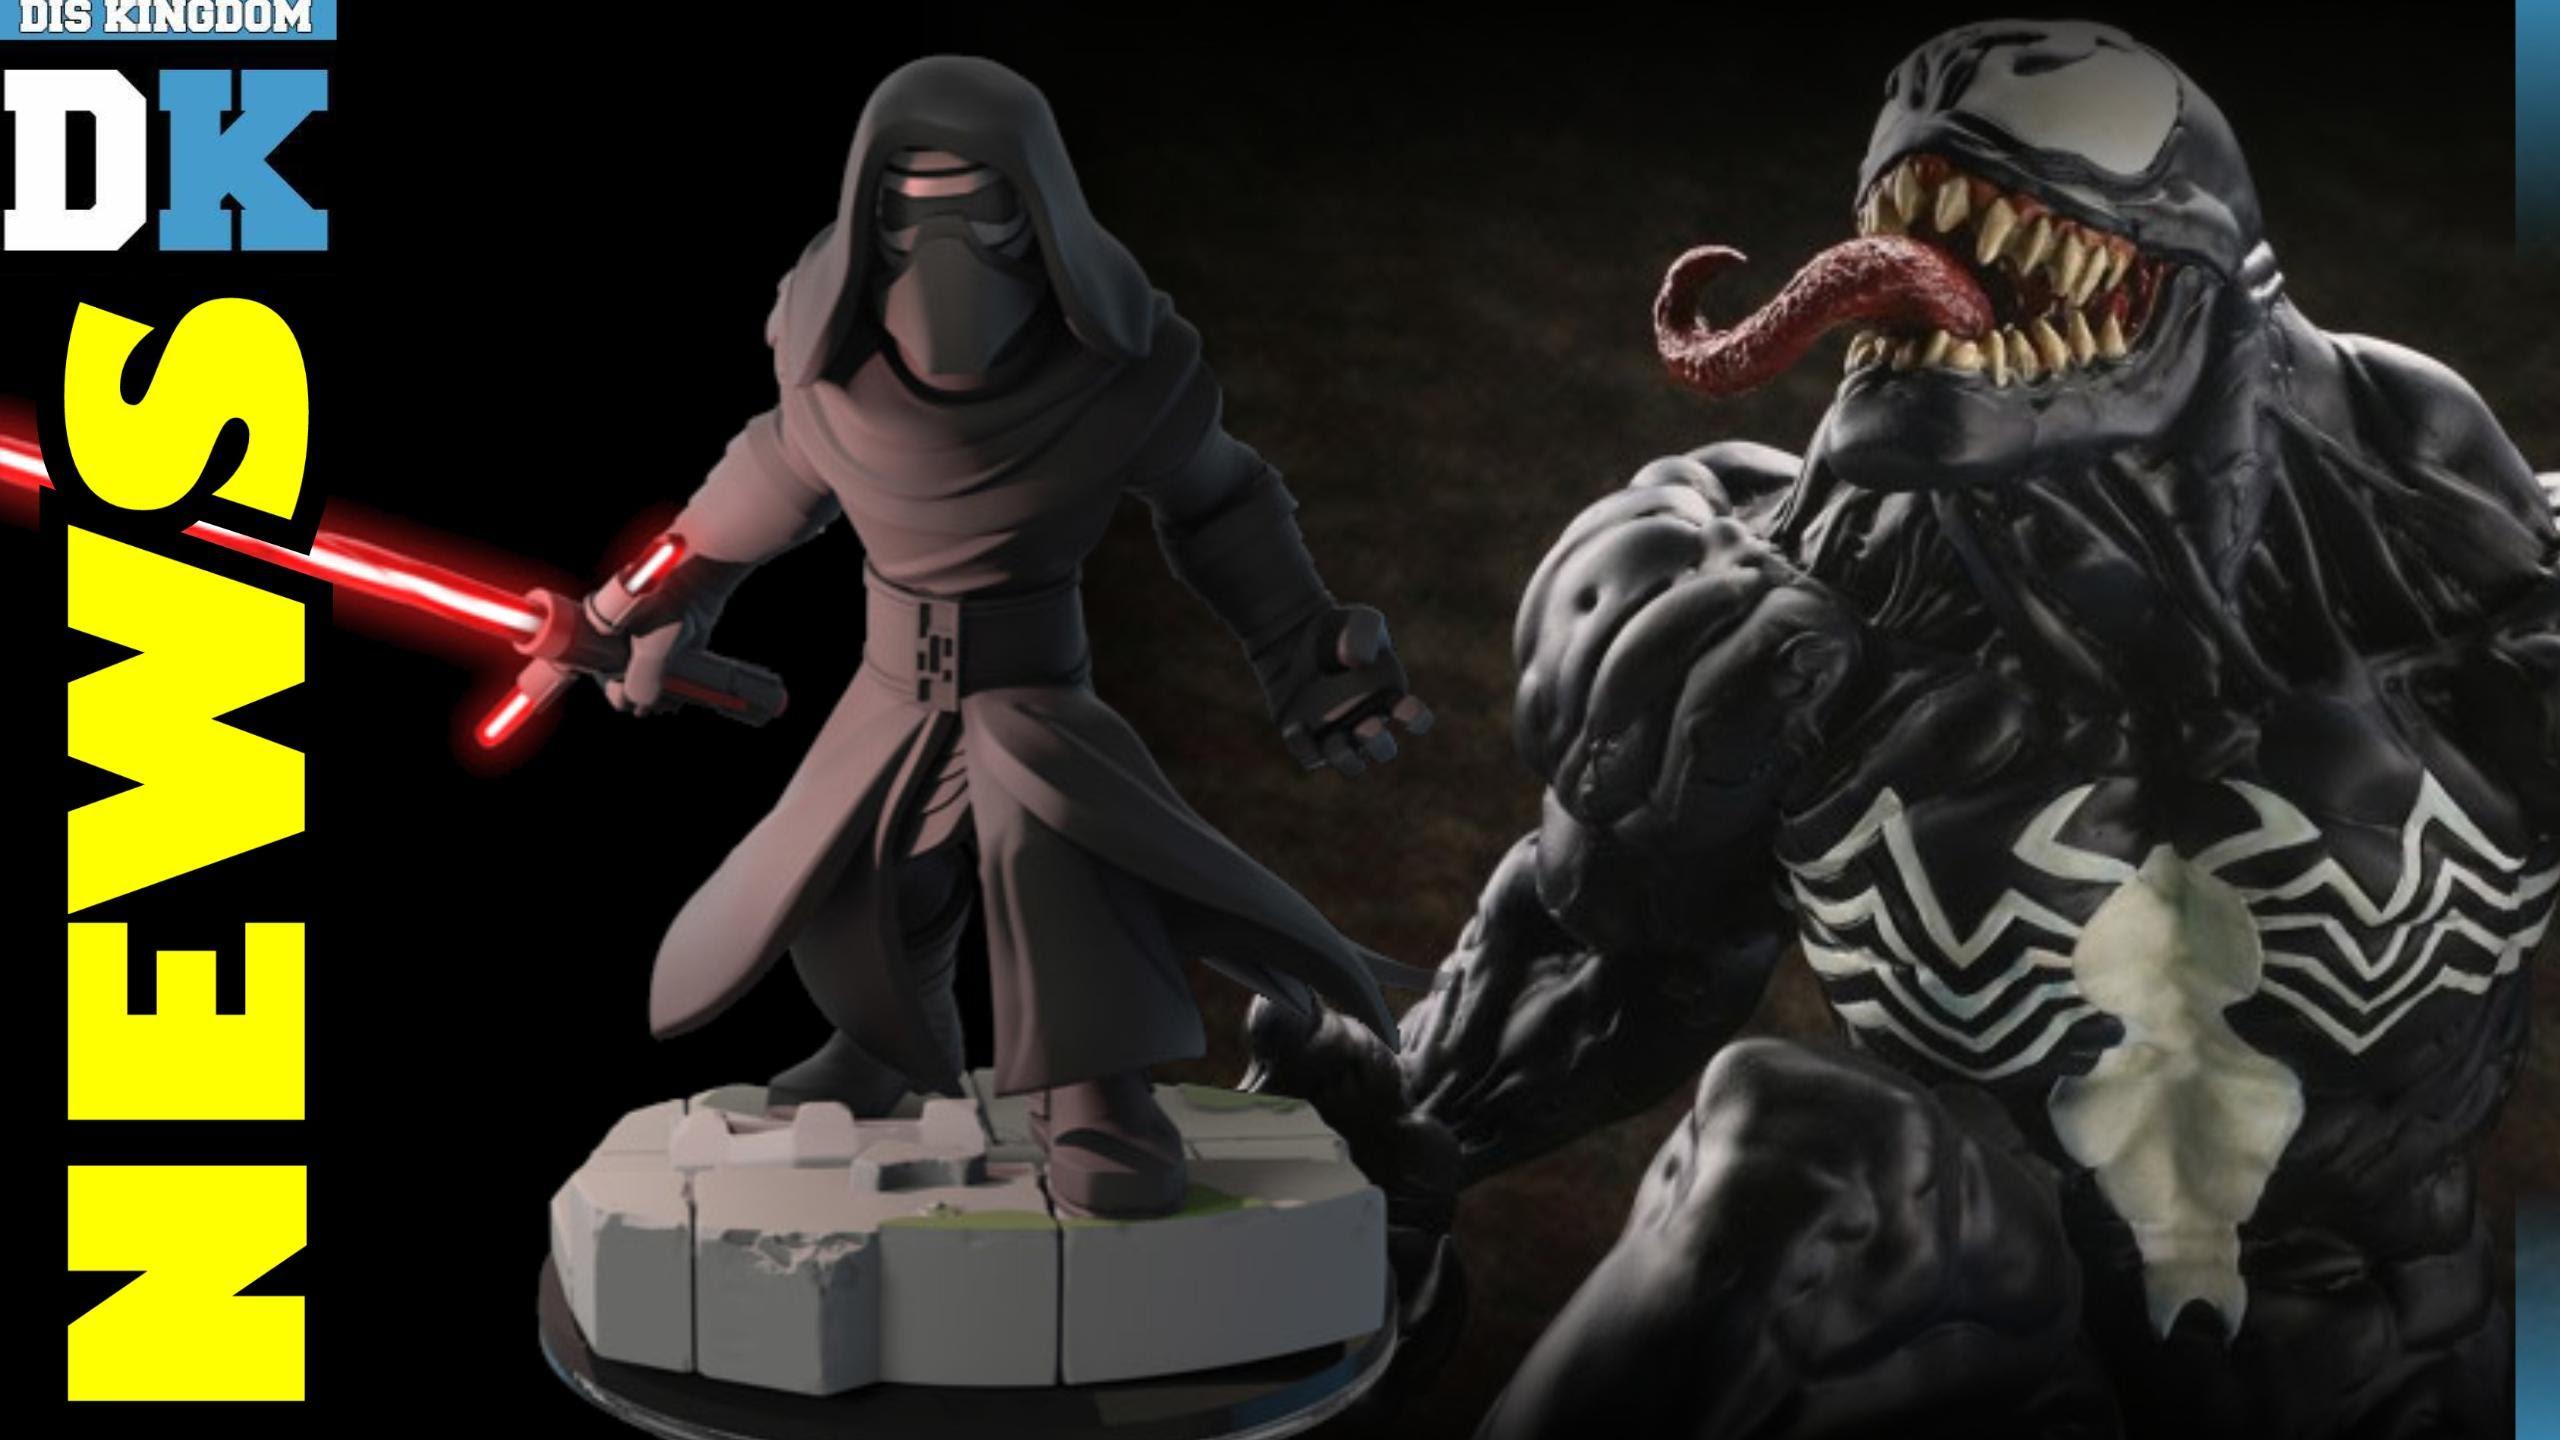 Disney Infinity 3.0 Kylo Ren Light FX Figure Details + Venom Solo Movie Coming Soon | DK News